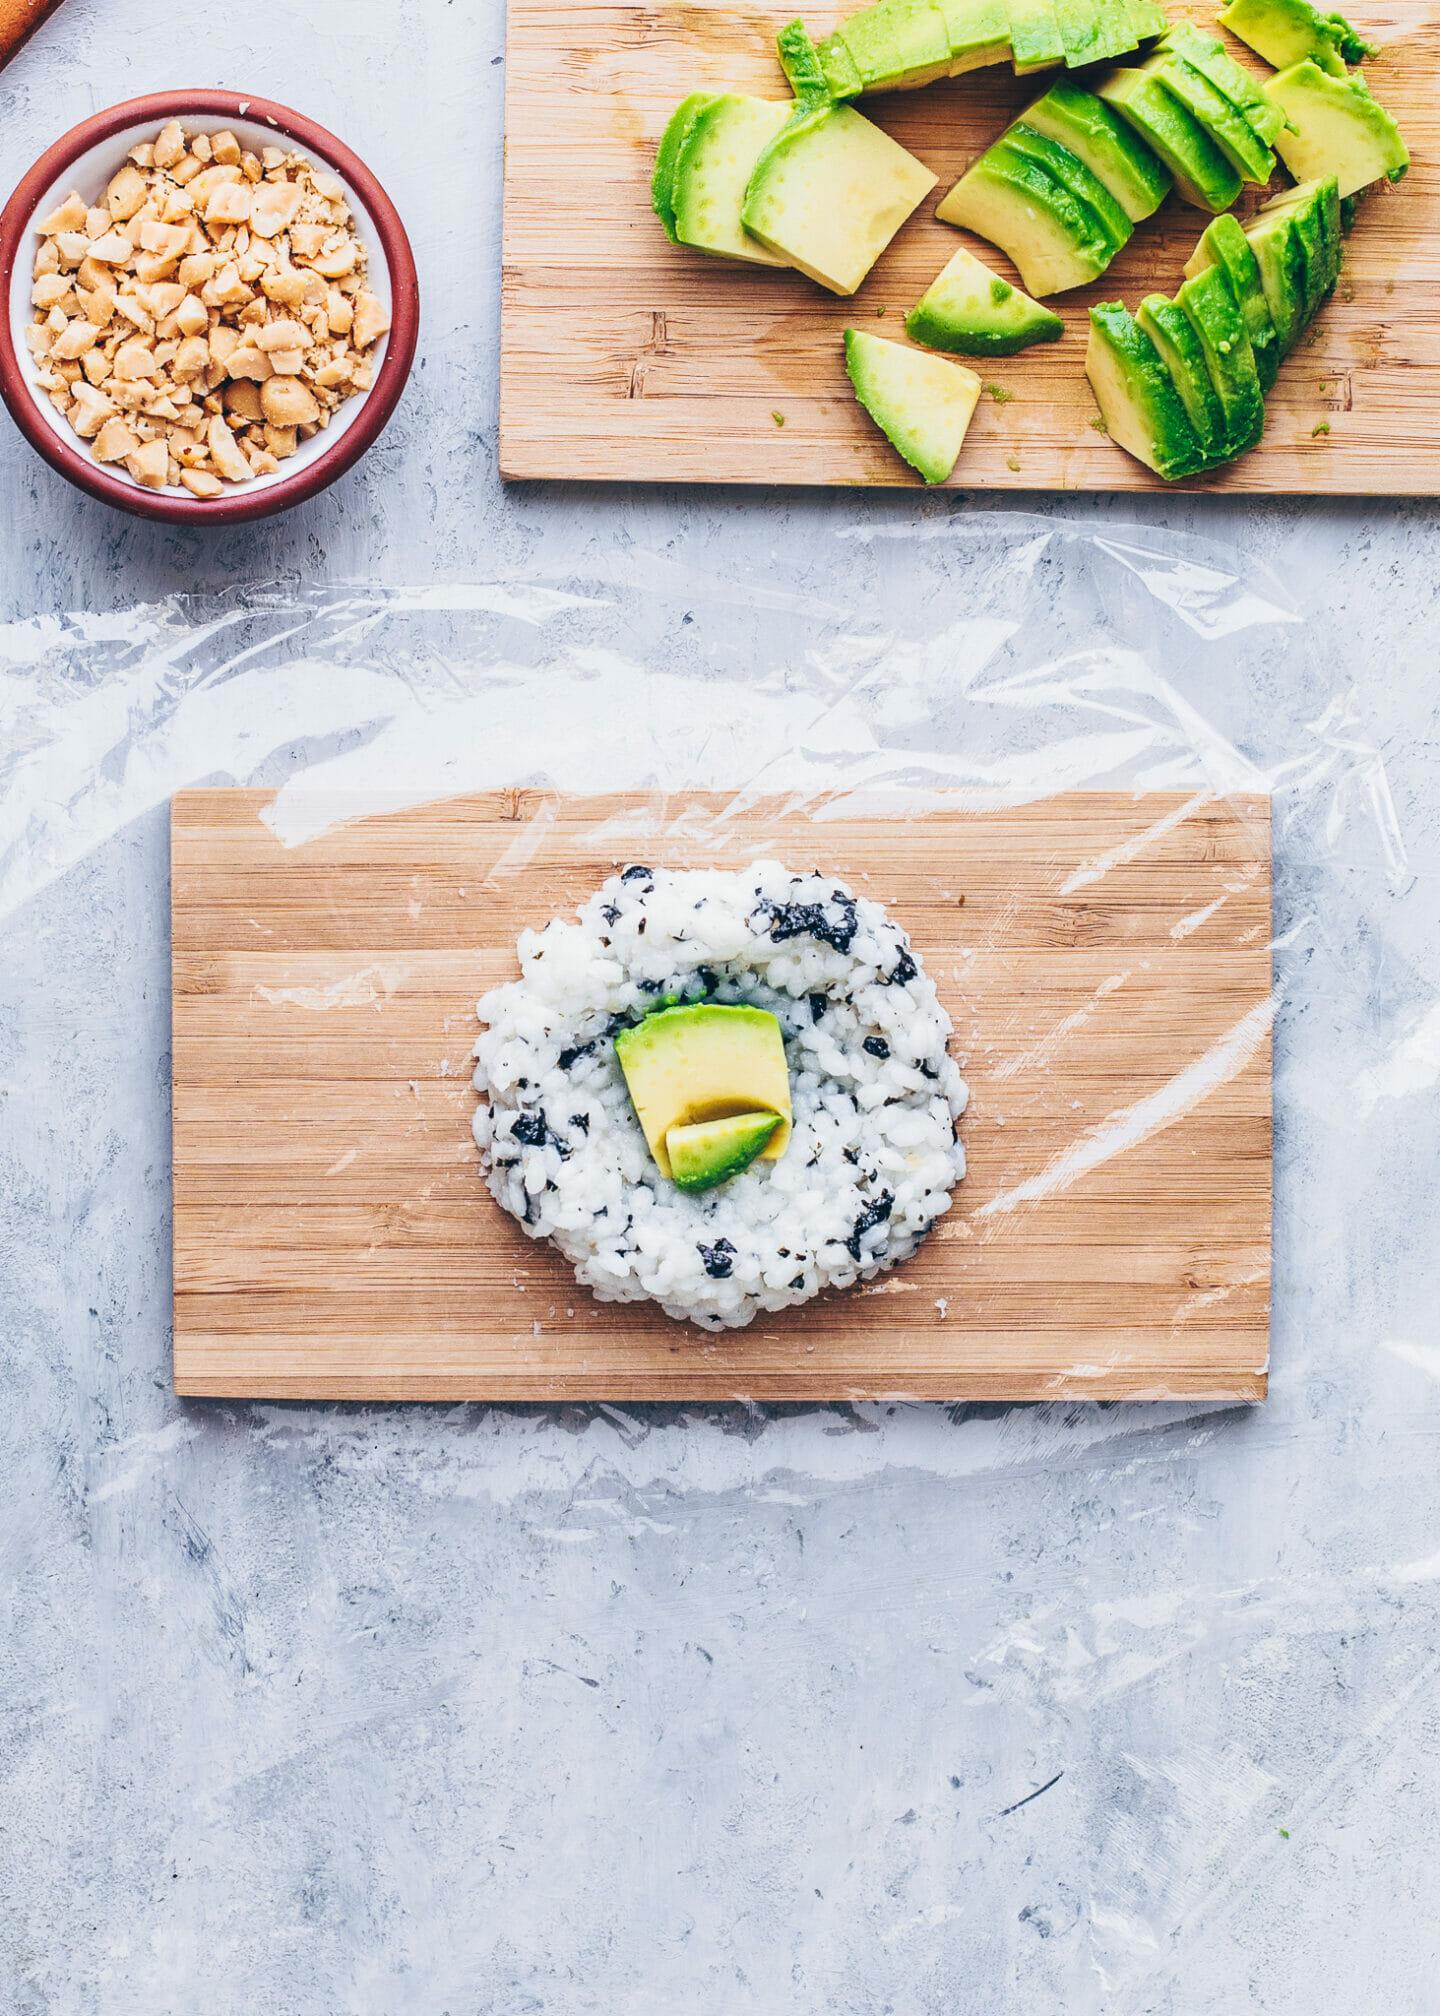 How to make Yaki Onigiri (Stuffed rice balls with avocado and peanuts)